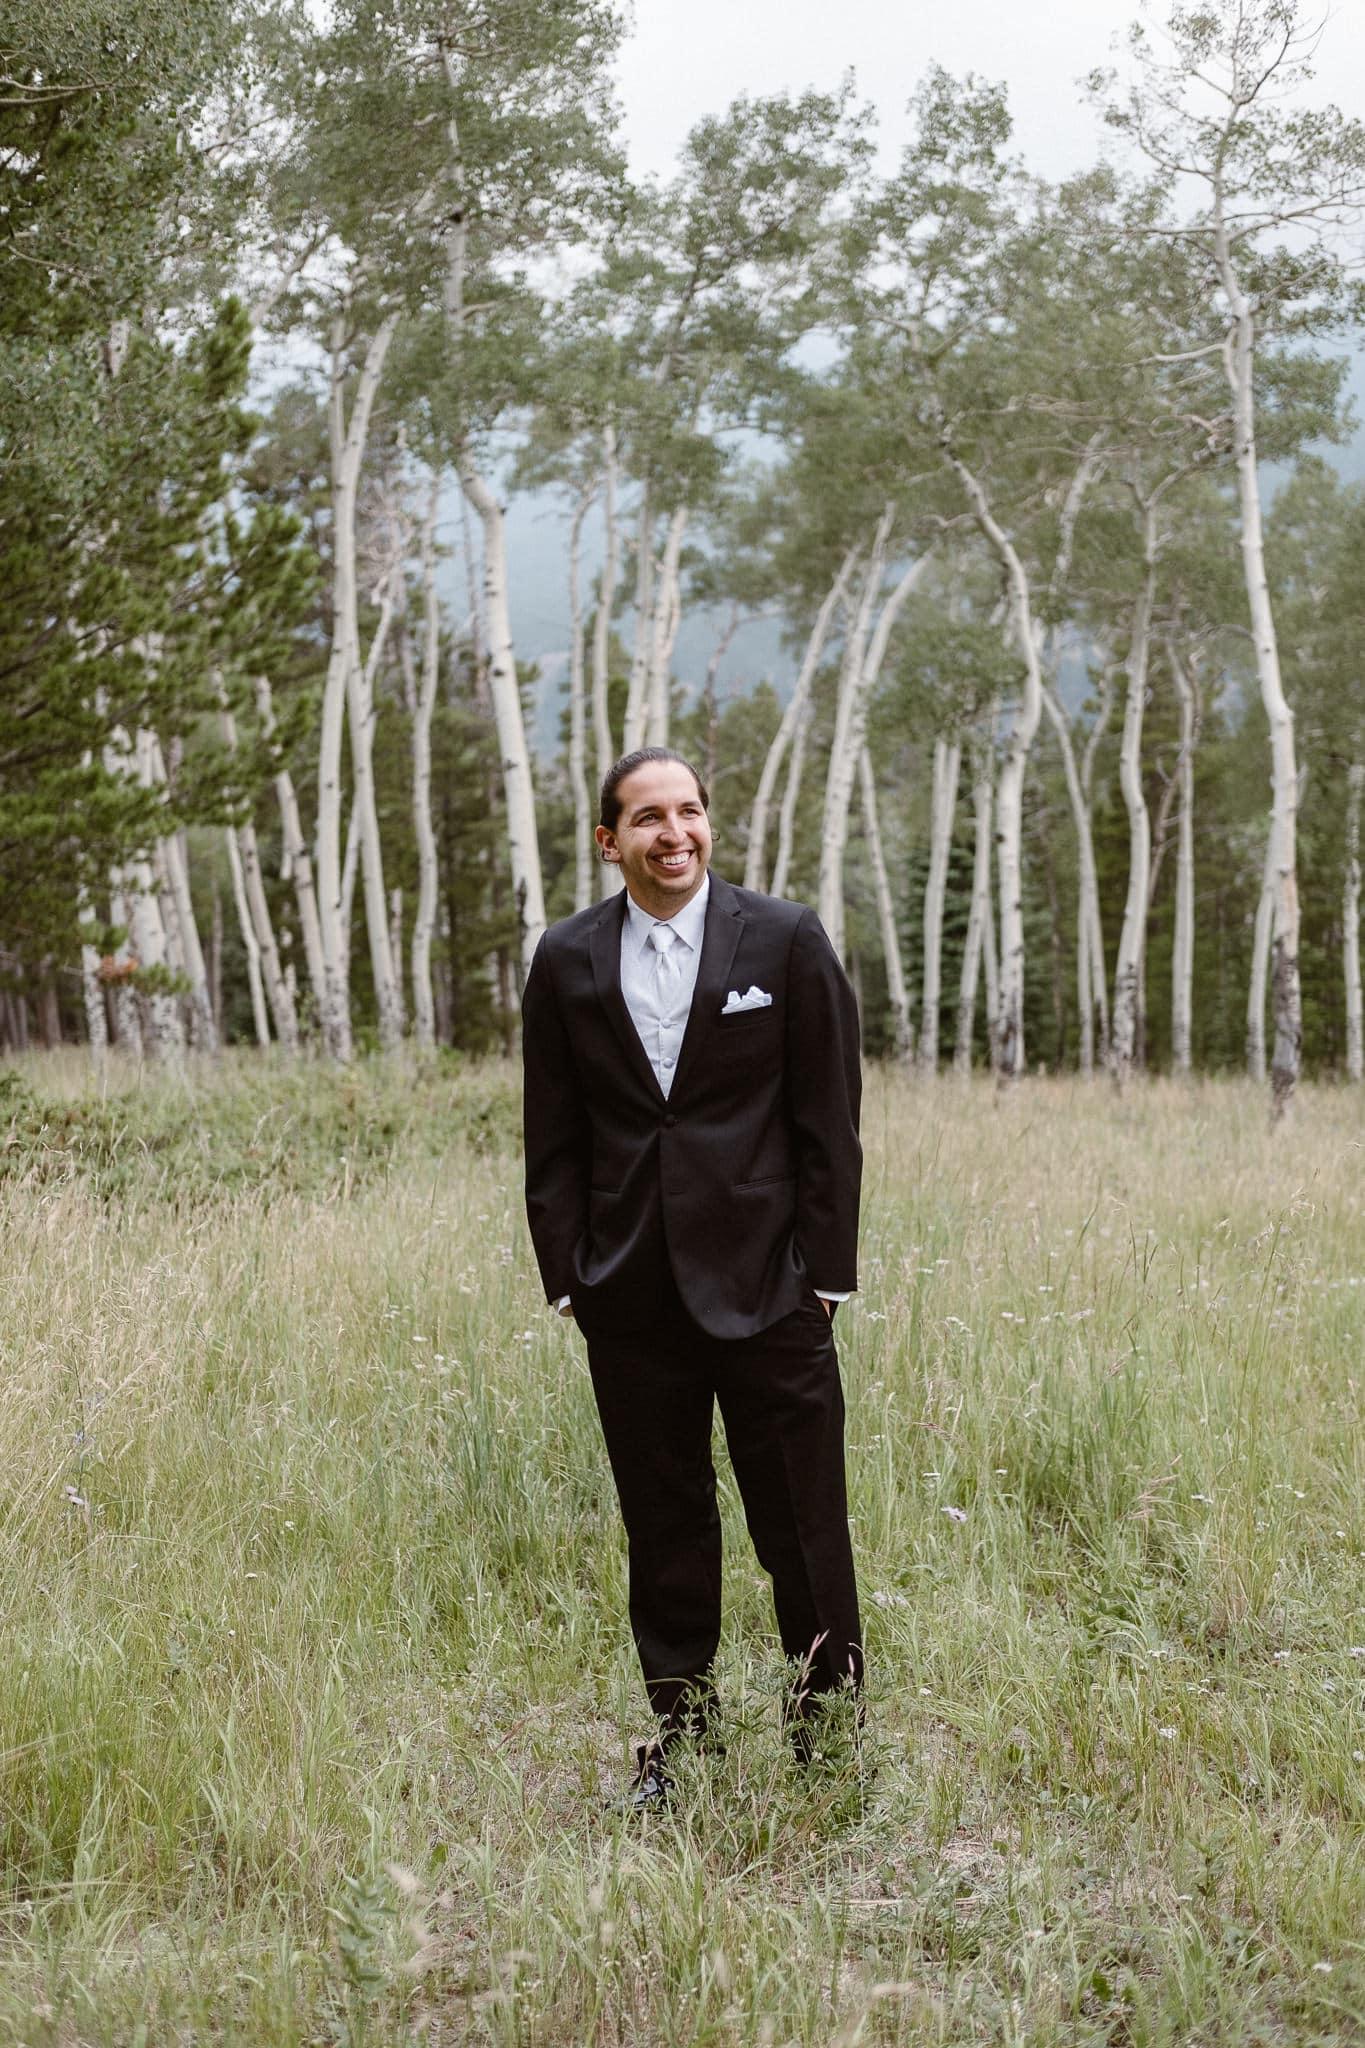 Dao House wedding photographer, Estes Park wedding venue, Colorado mountain wedding, outdoor ceremony, mountain ceremony, groom portrait, aspen grove,